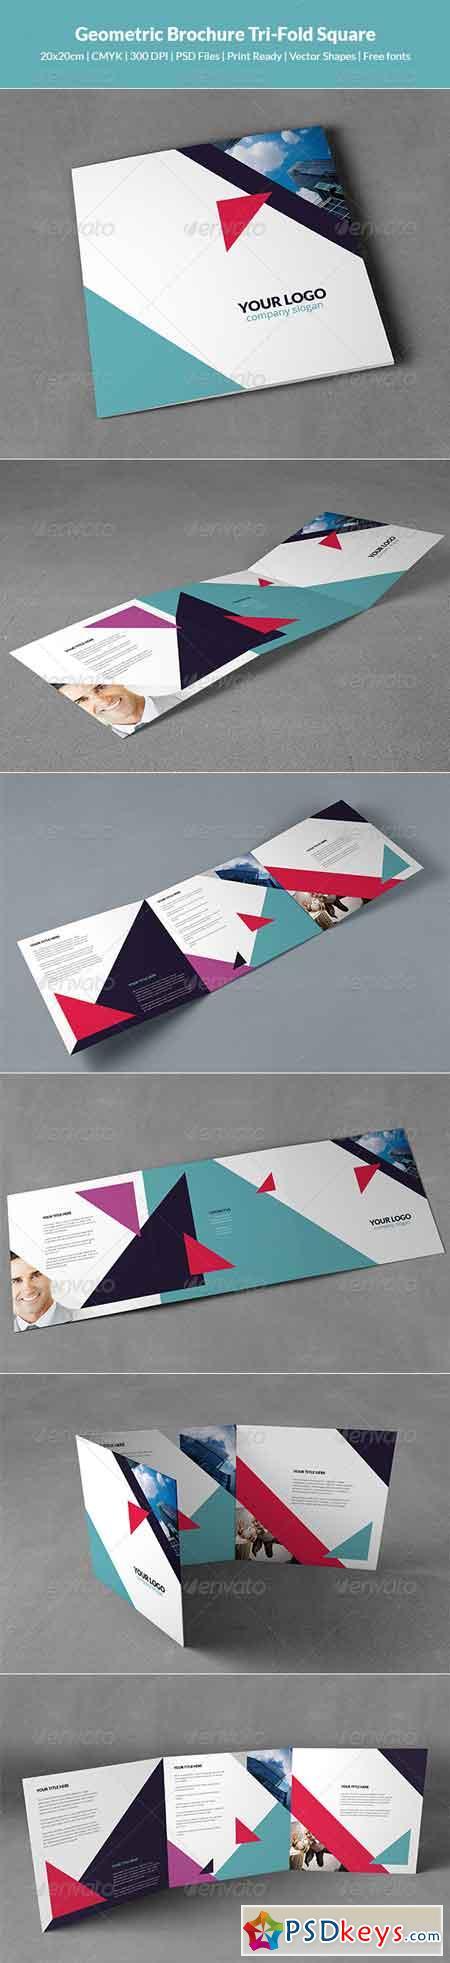 Geometric Brochure Tri-Fold Square 8548184